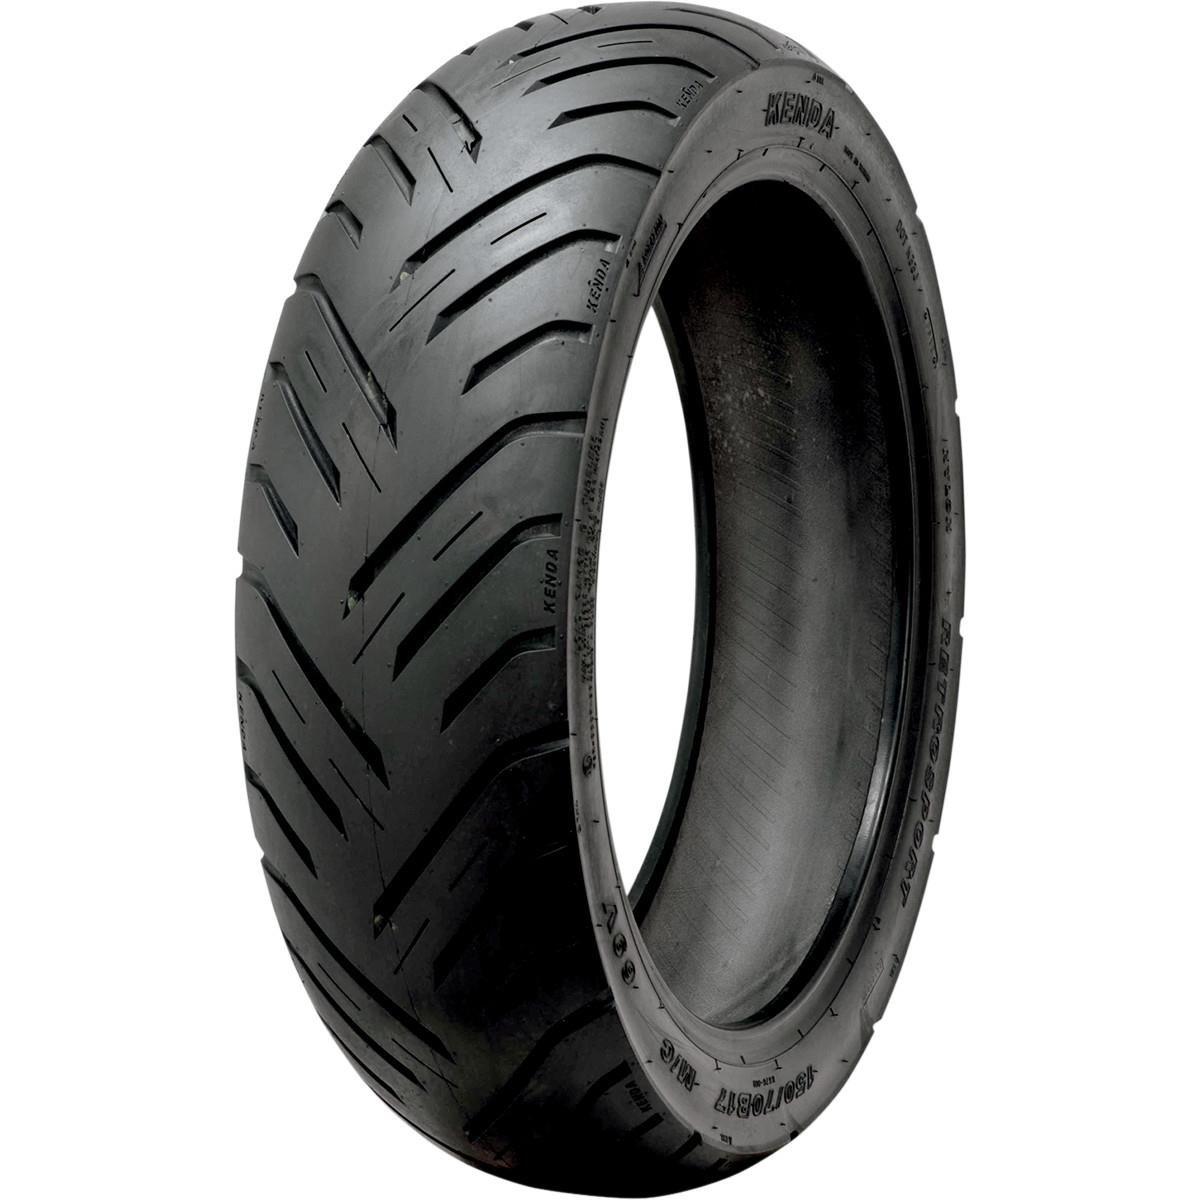 Kenda K676 RetroActive Tire - Rear - 150/80B-16 , Position: Rear, Rim Size: 16, Tire Application: Sport, Tire Size: 150/80-16, Tire Type: Street, Speed Rating: V, Tire Construction: Bias 133Q1000